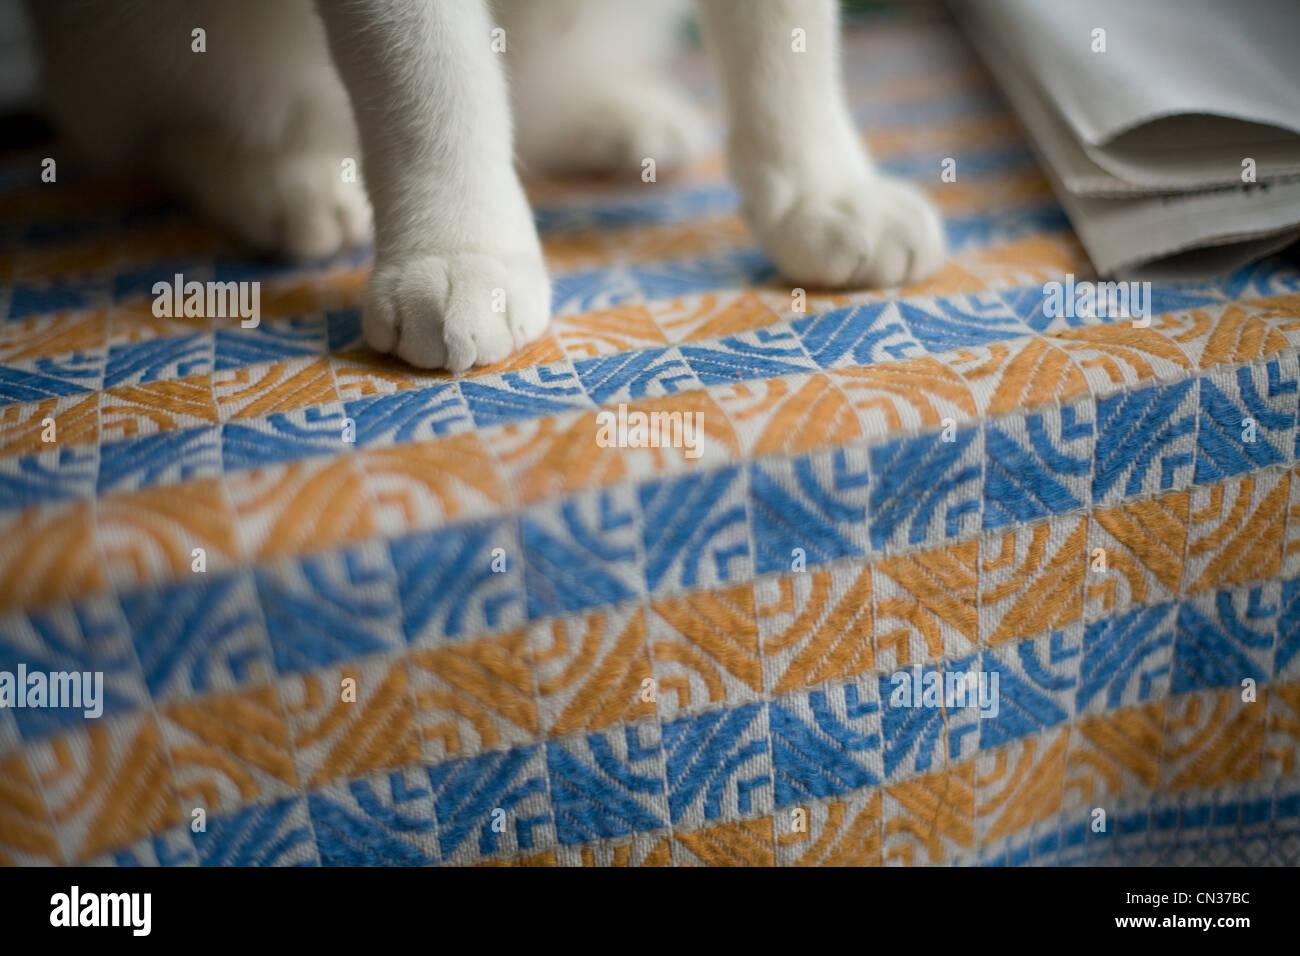 Cat's paws, close up - Stock Image